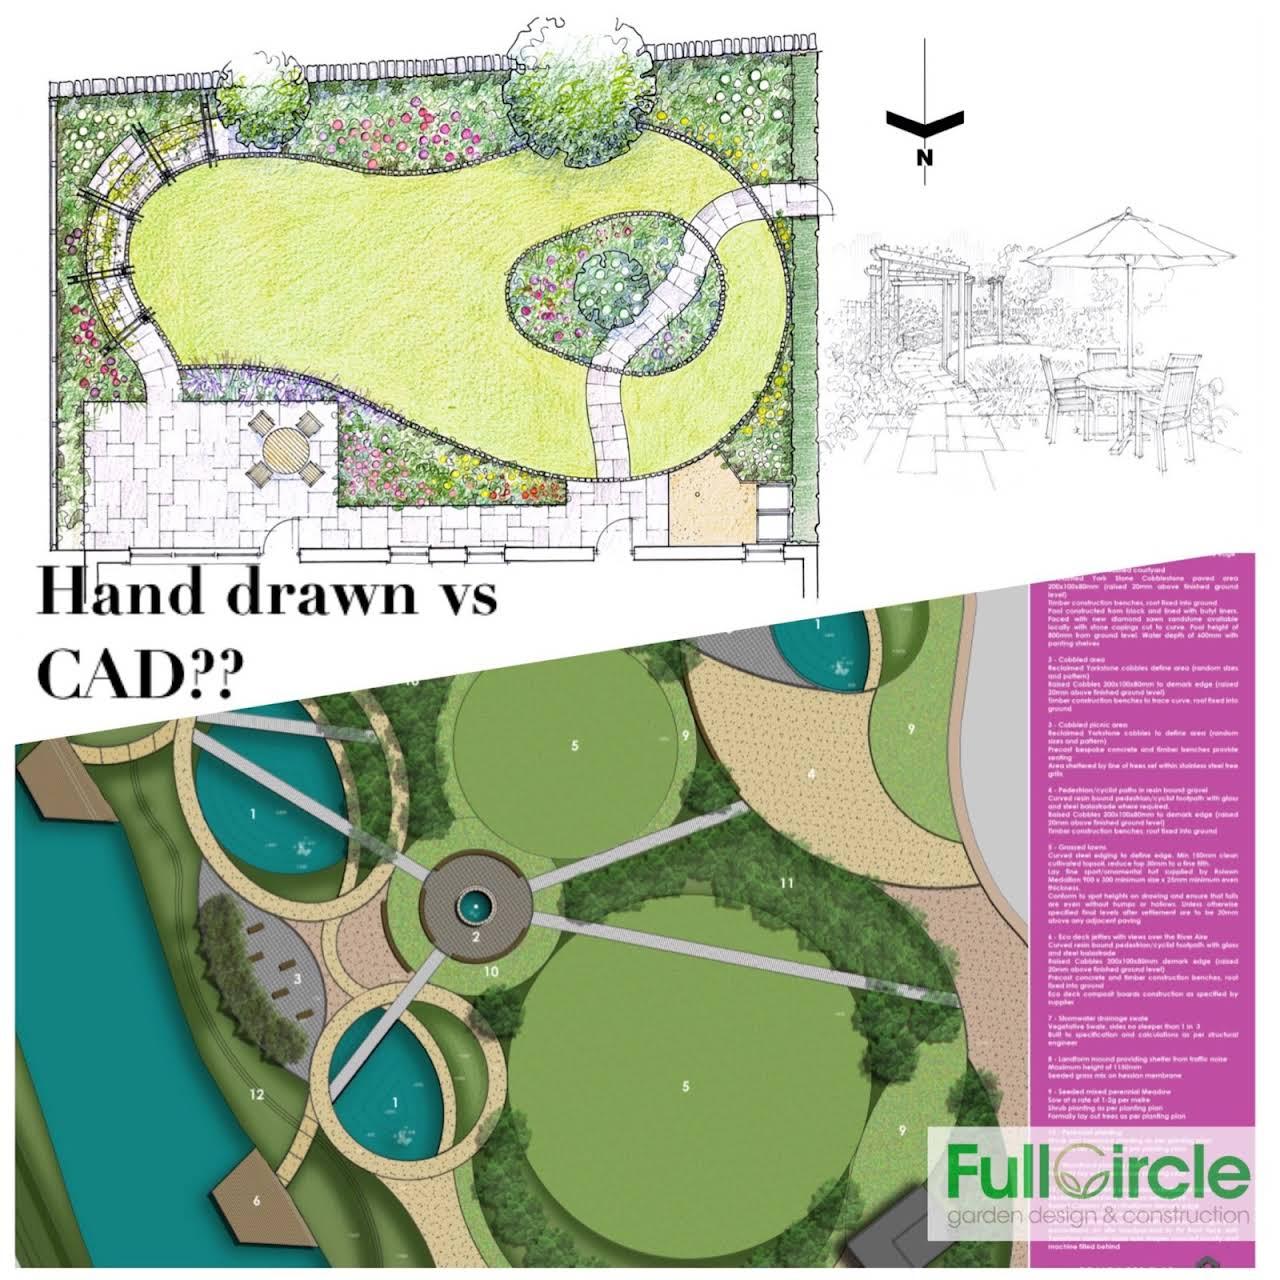 Full Circle Garden Design & Construction LTD - Landscape ...